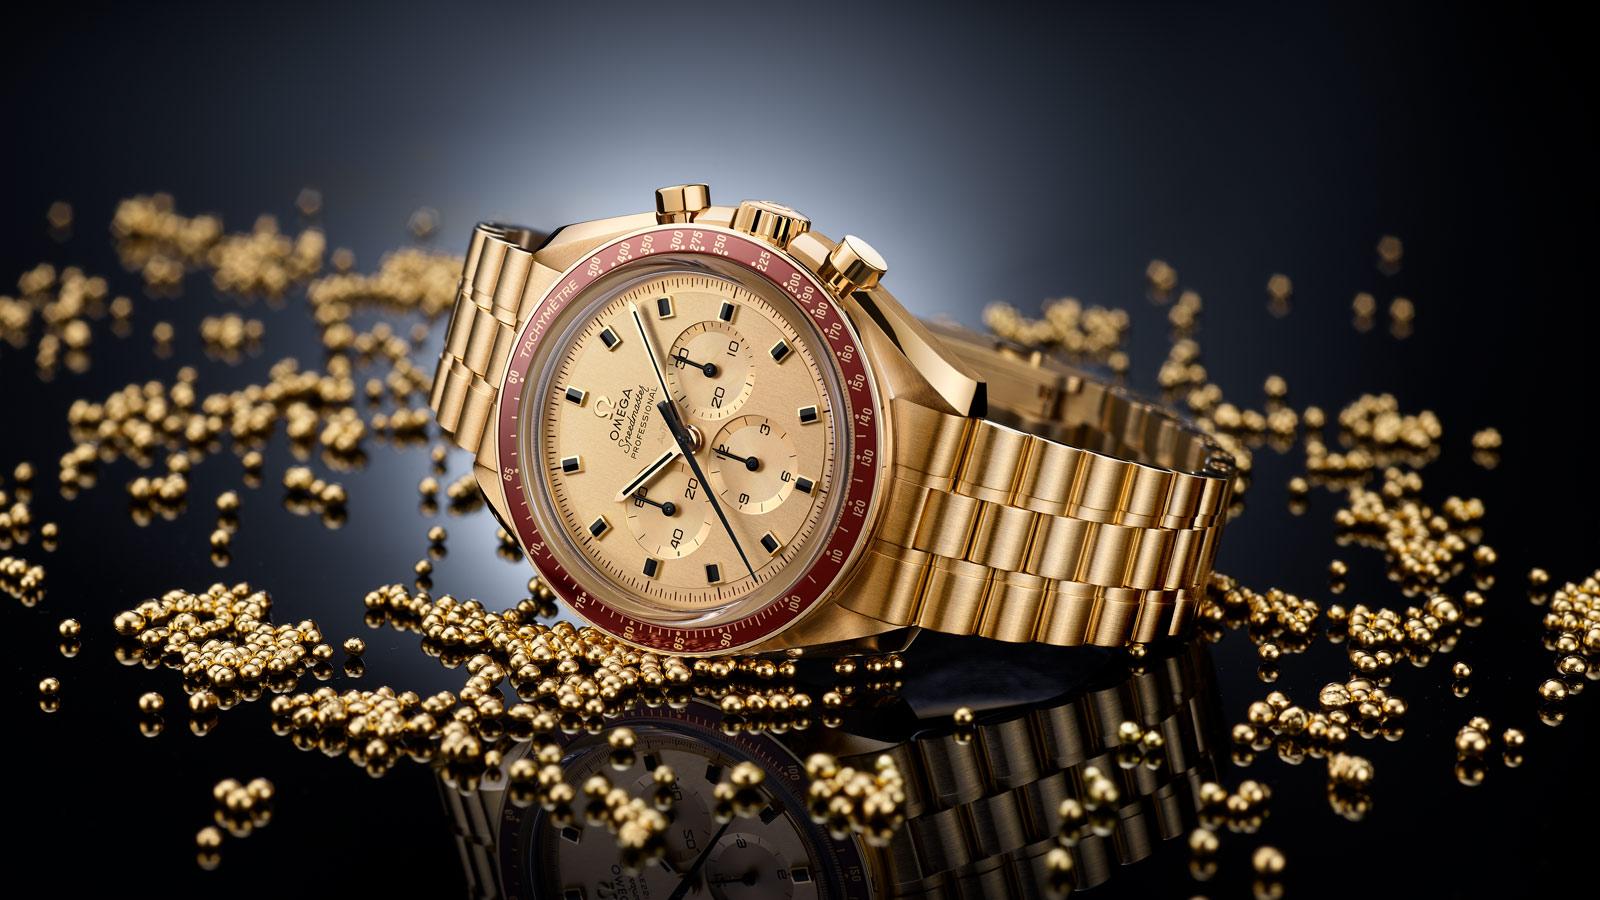 Relojes de Omega